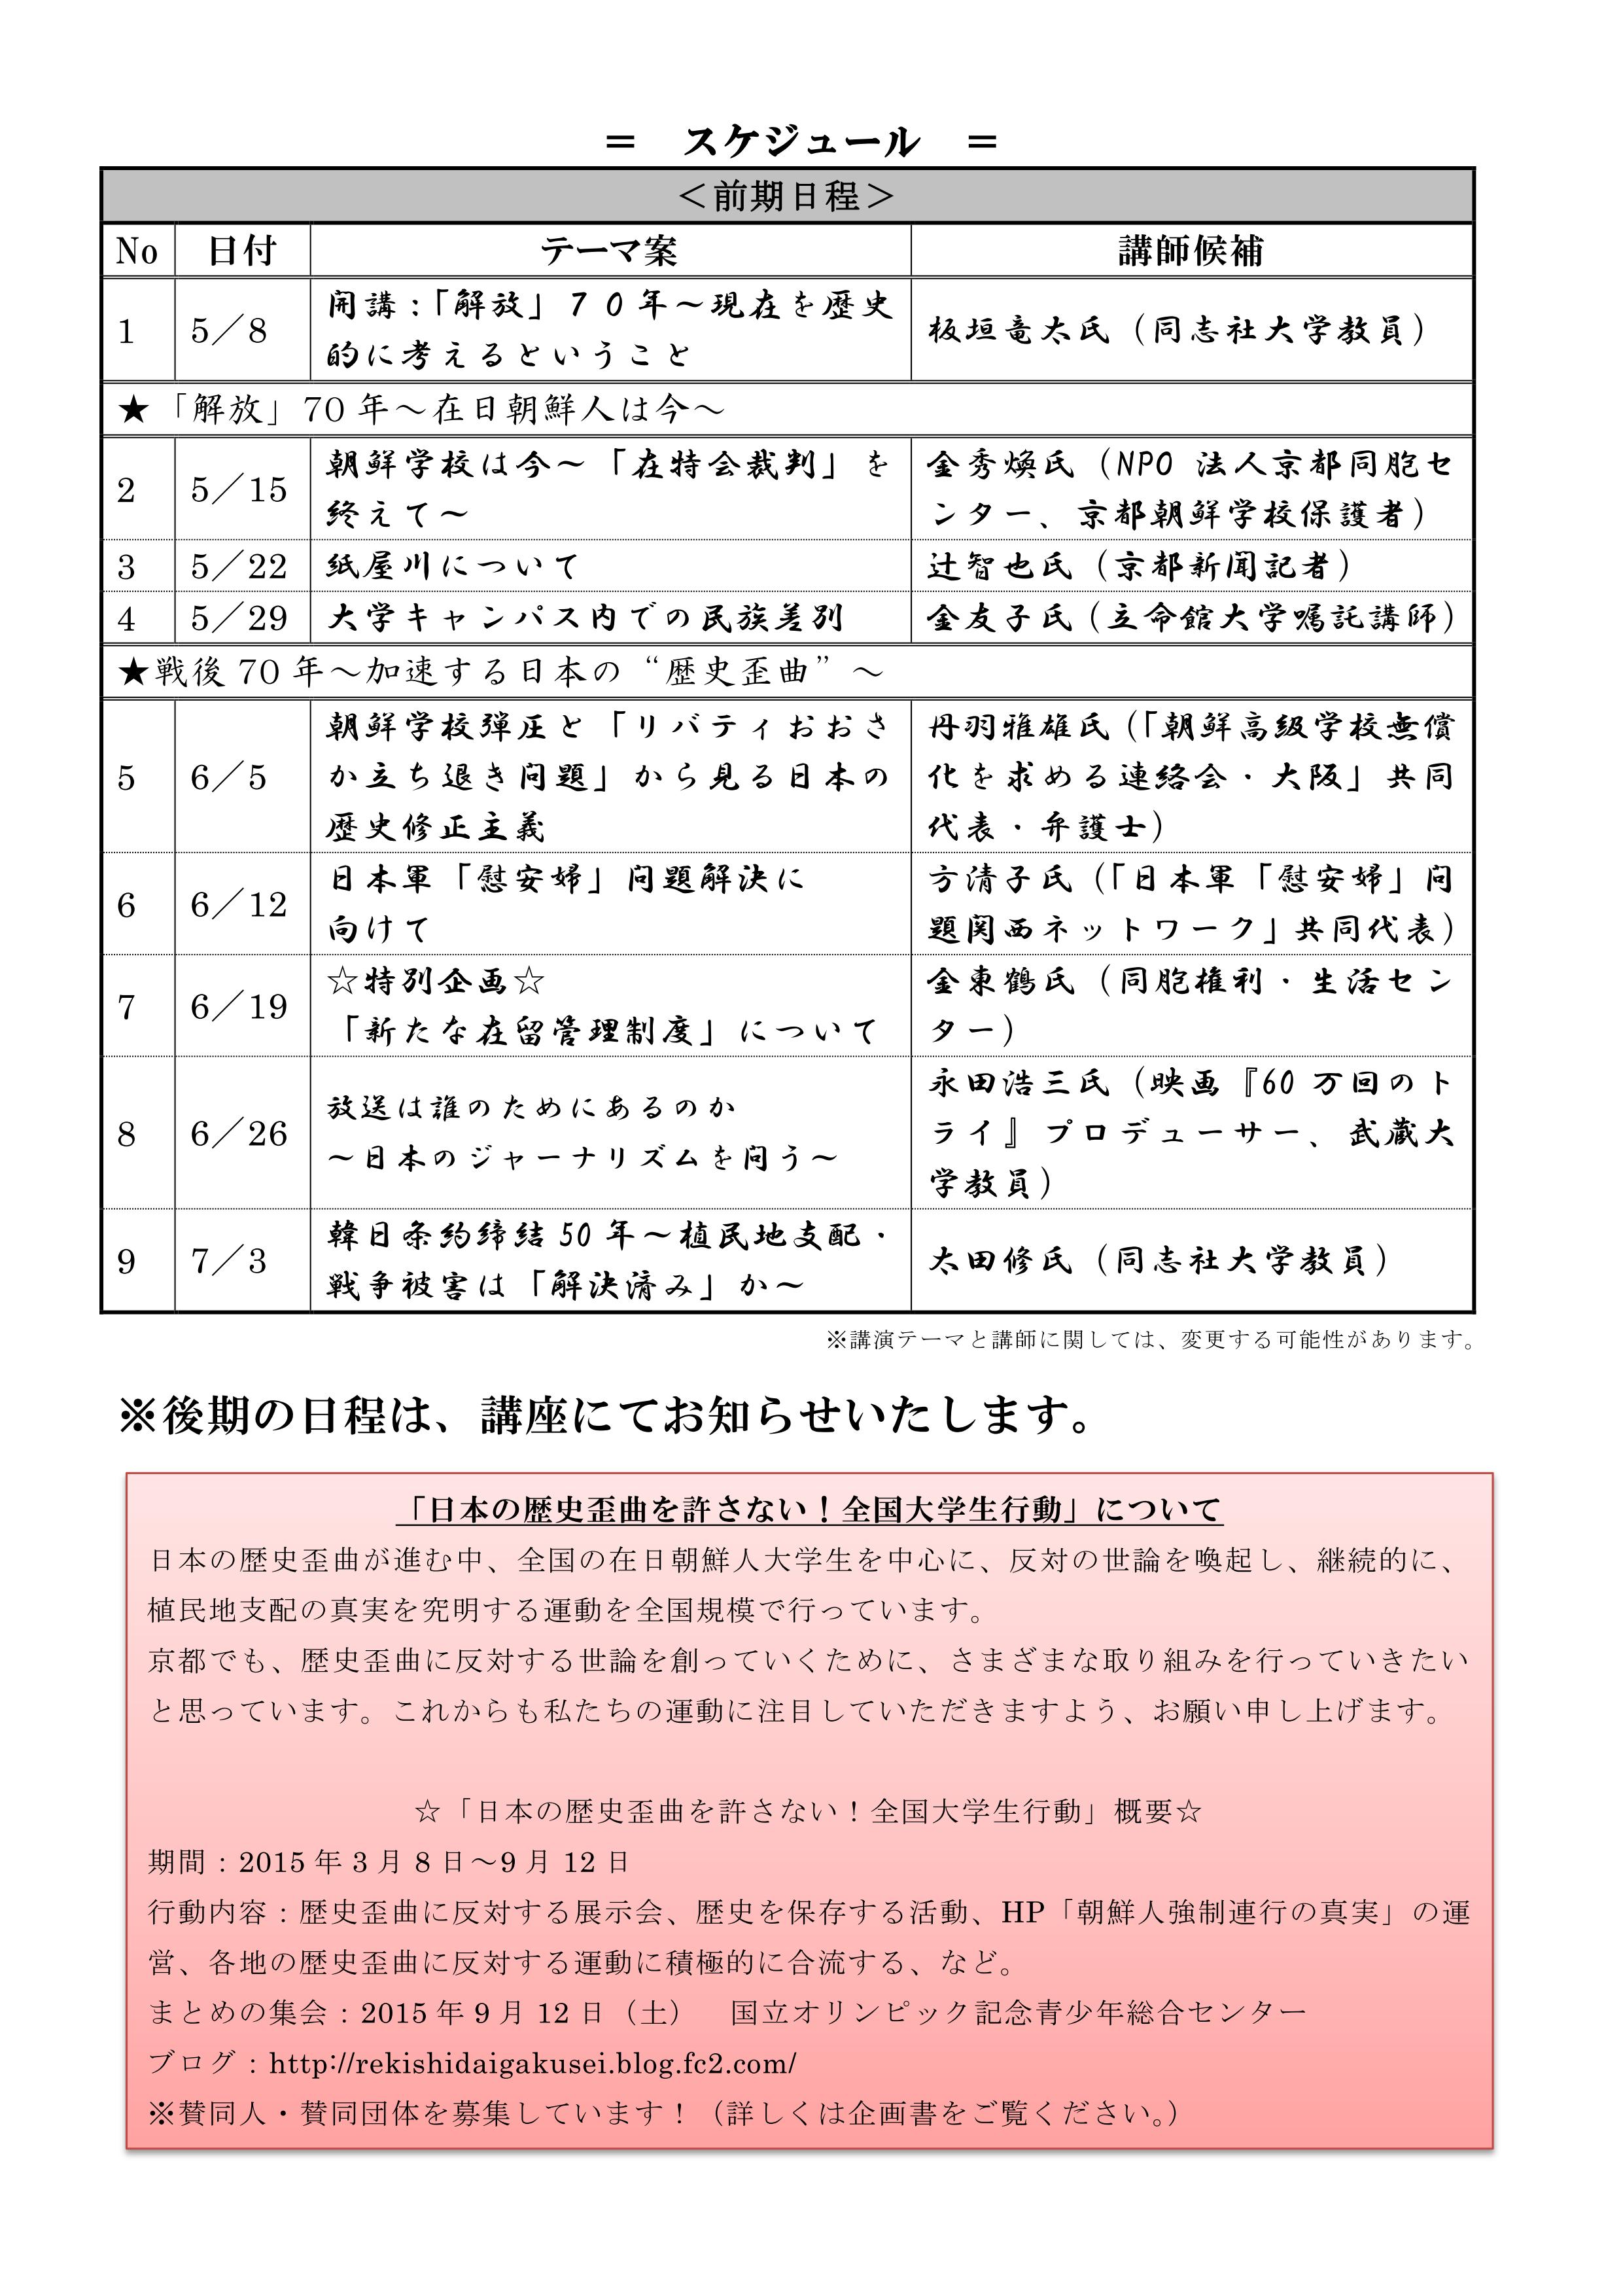 15日朝関係史講座 前期チラシ_02